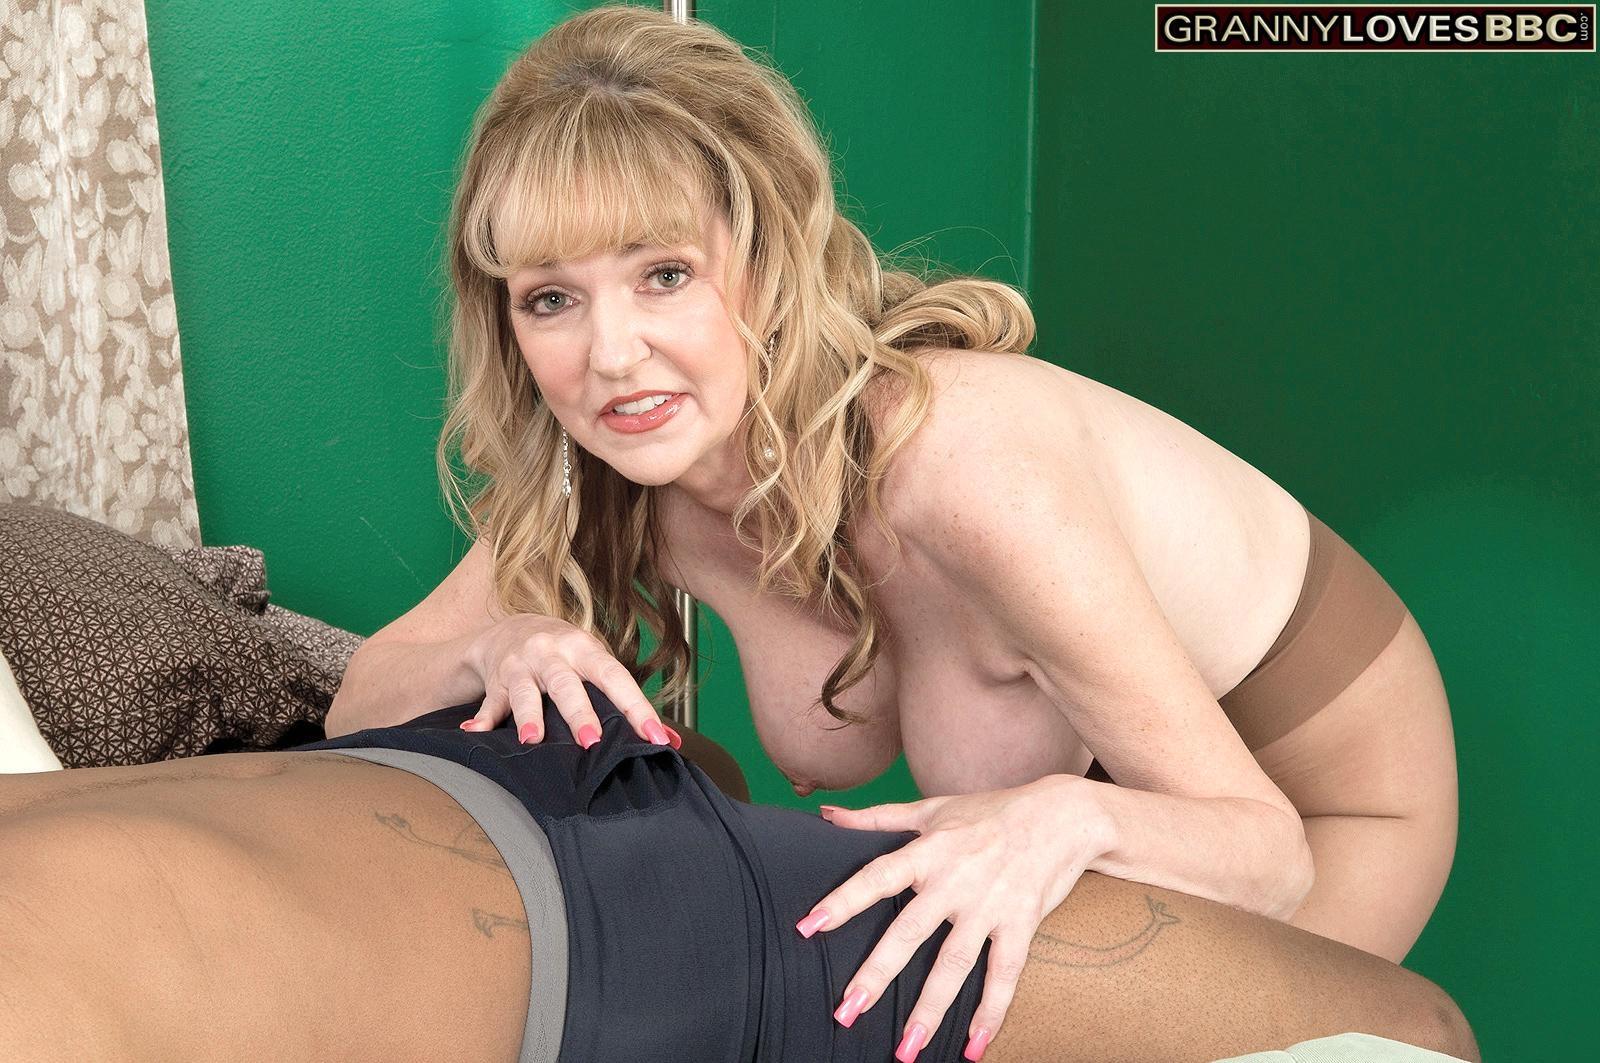 Petite granny Janee Diamond exposes her big tits before sucking a big black dick